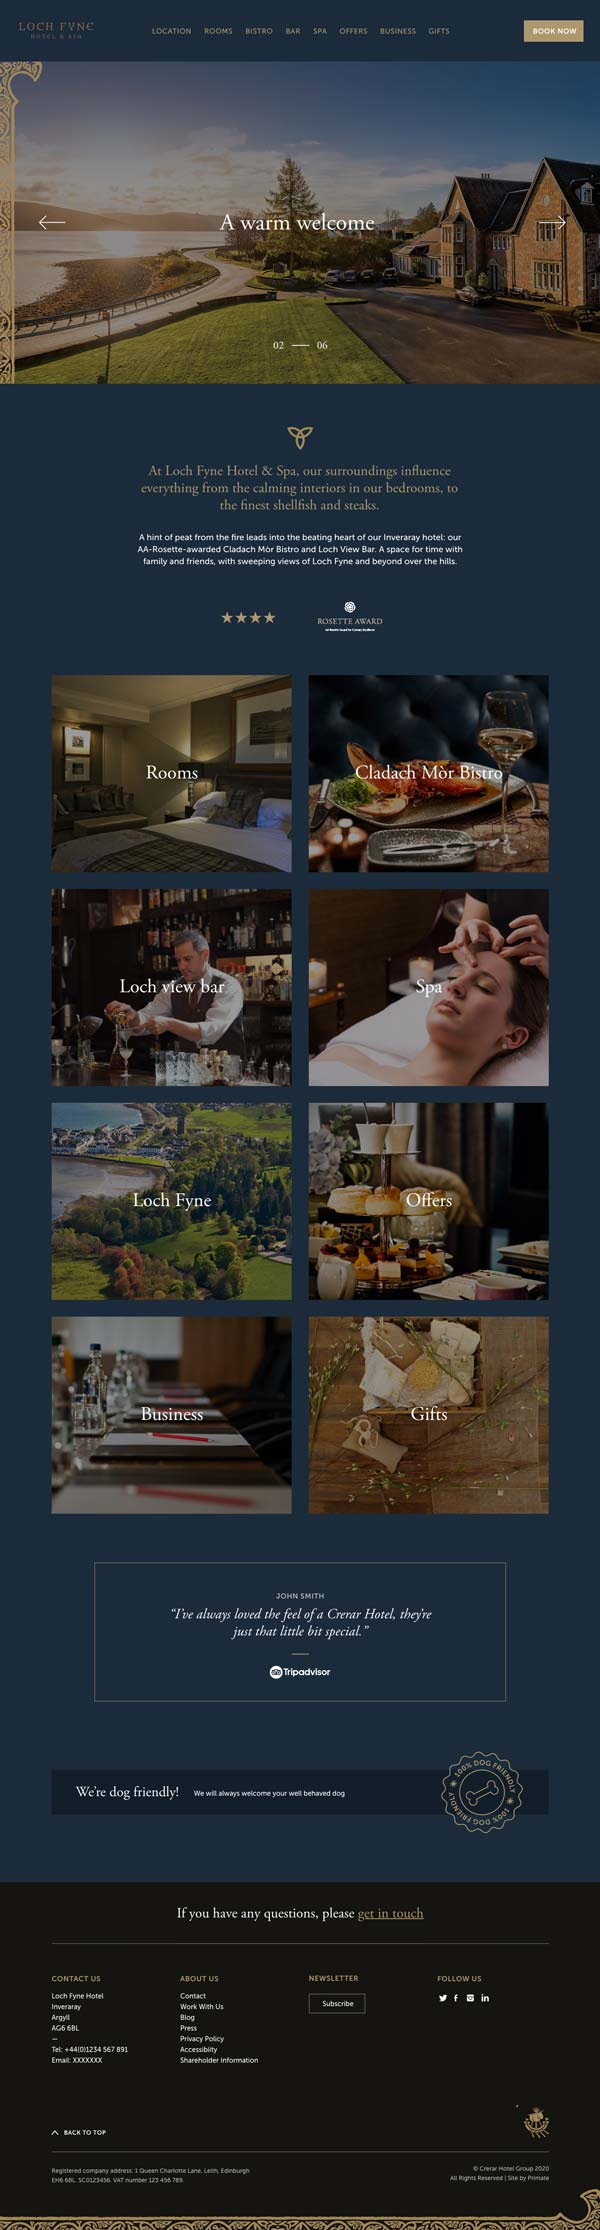 Crerar Hotels website